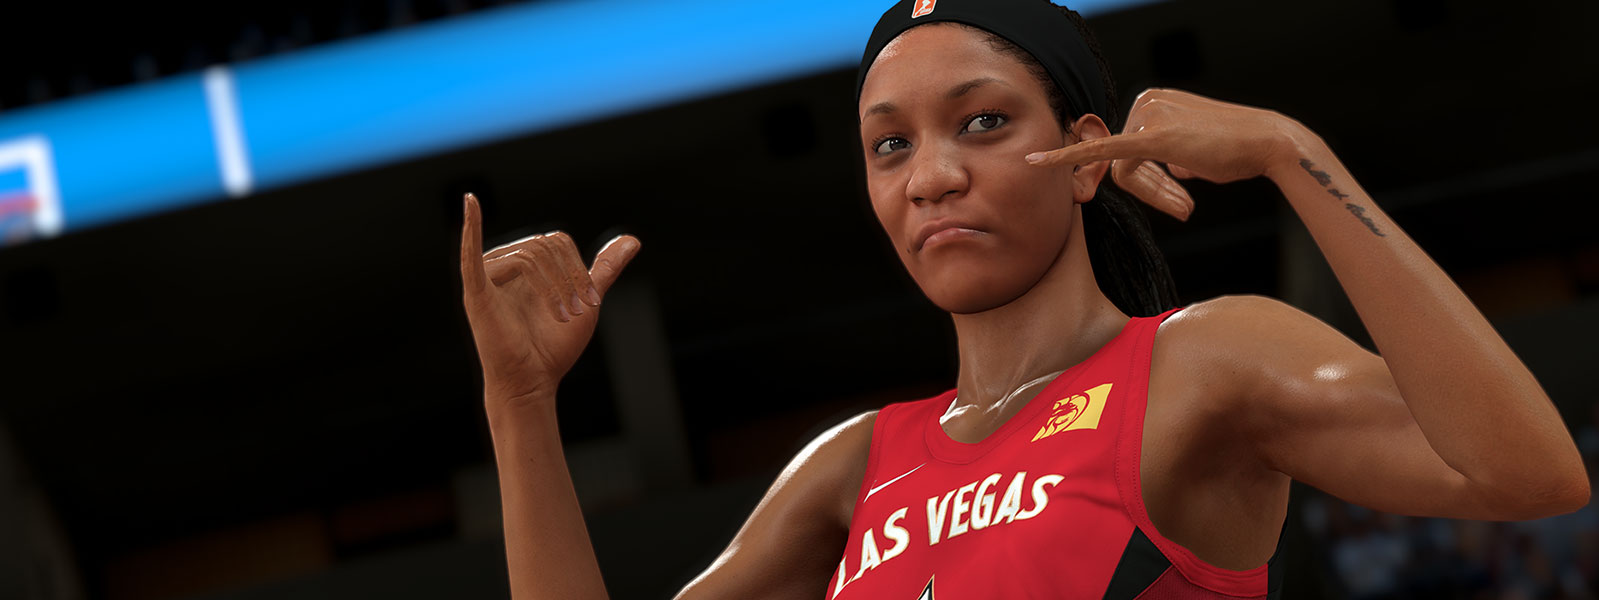 Las Vegas WNBA player posing